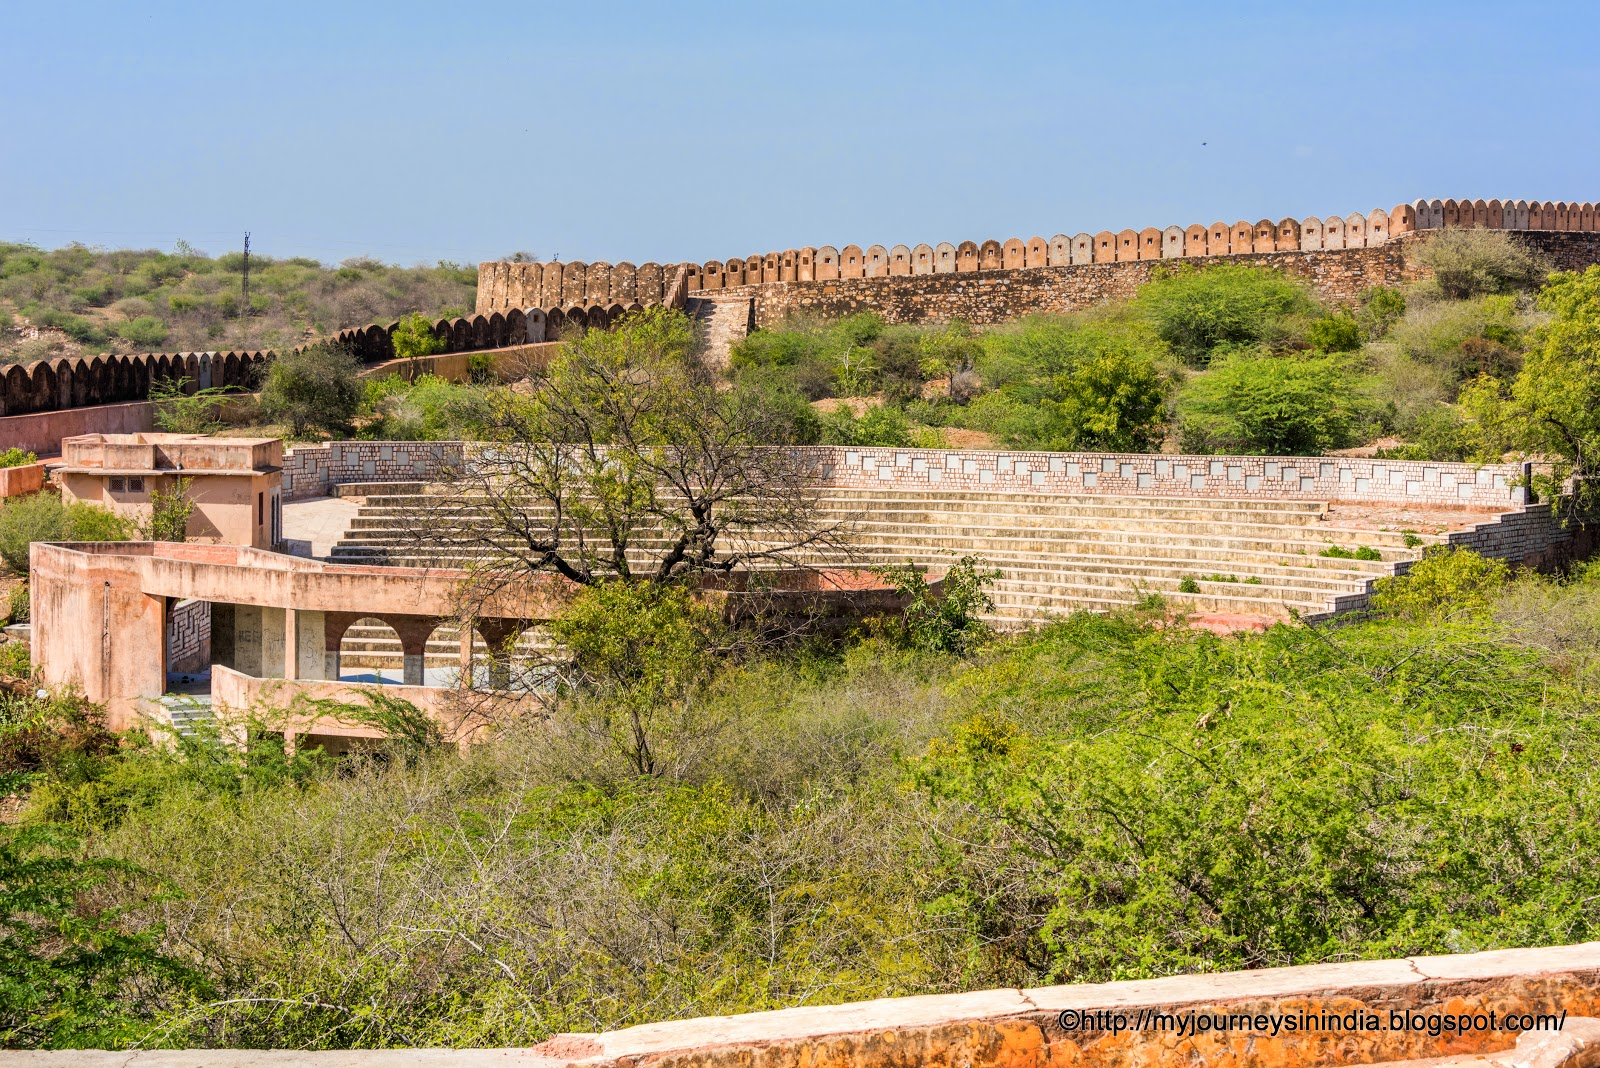 Amphitheatre in Nahargarh Fort Jaipur